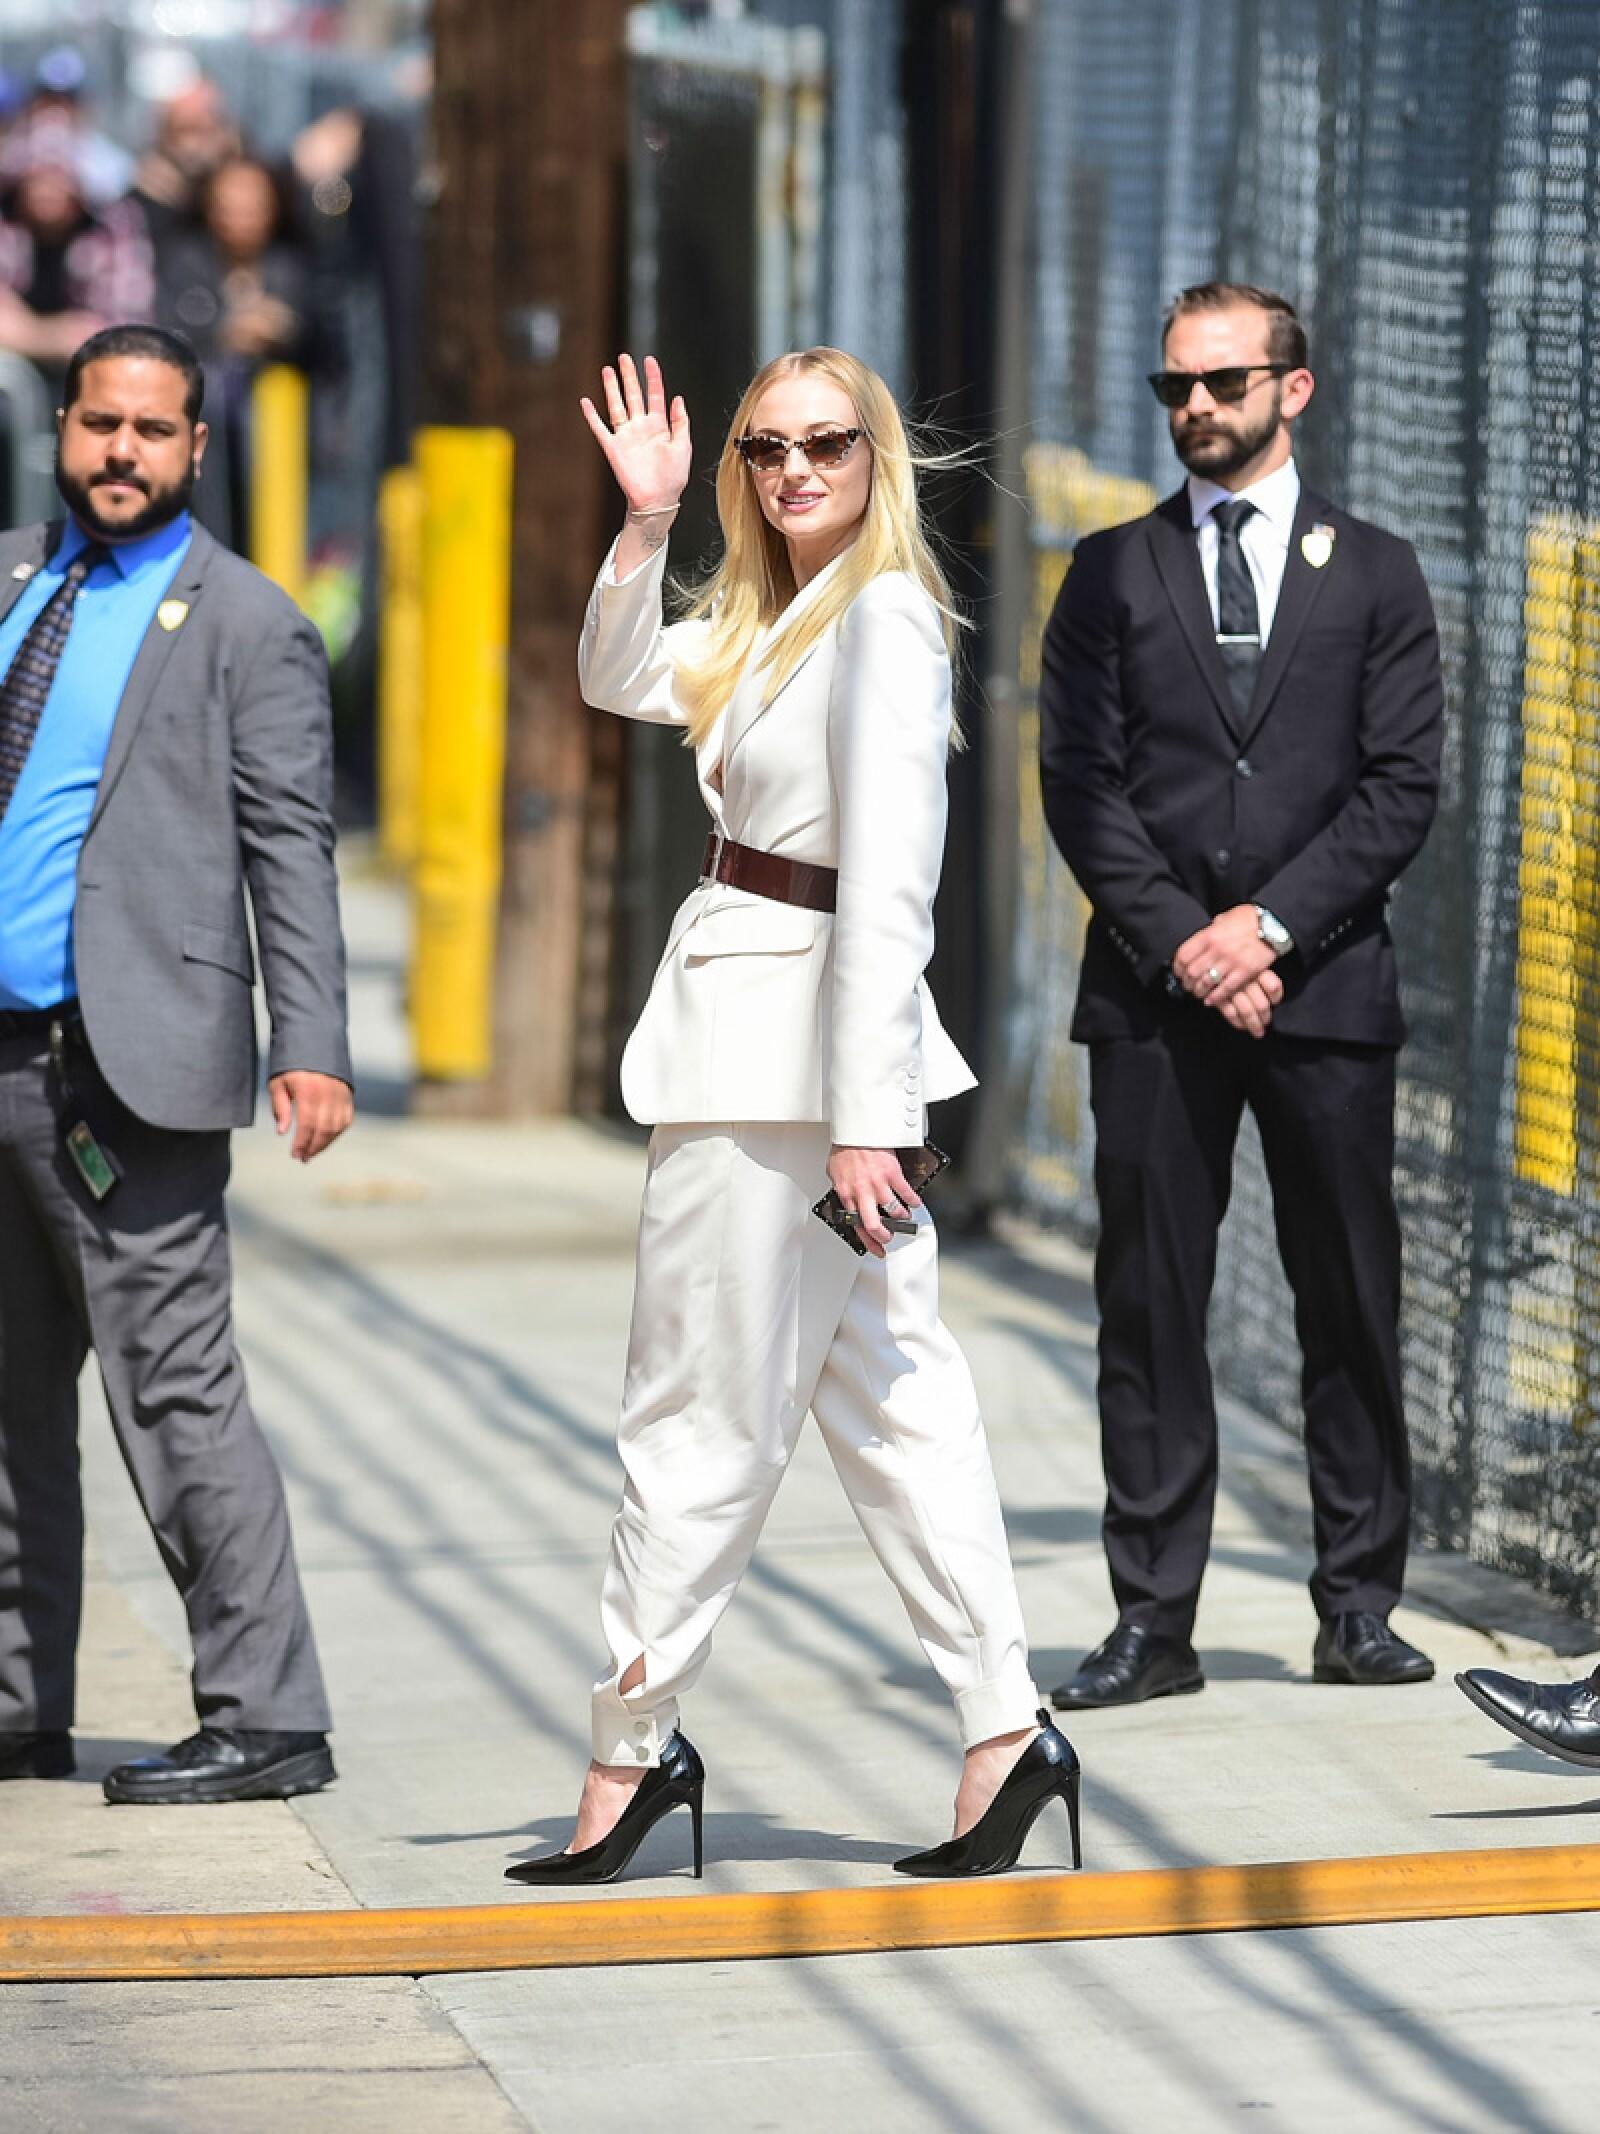 'Jimmy Kimmel Live' TV Show, Los Angeles, USA - 04 Jun 2019